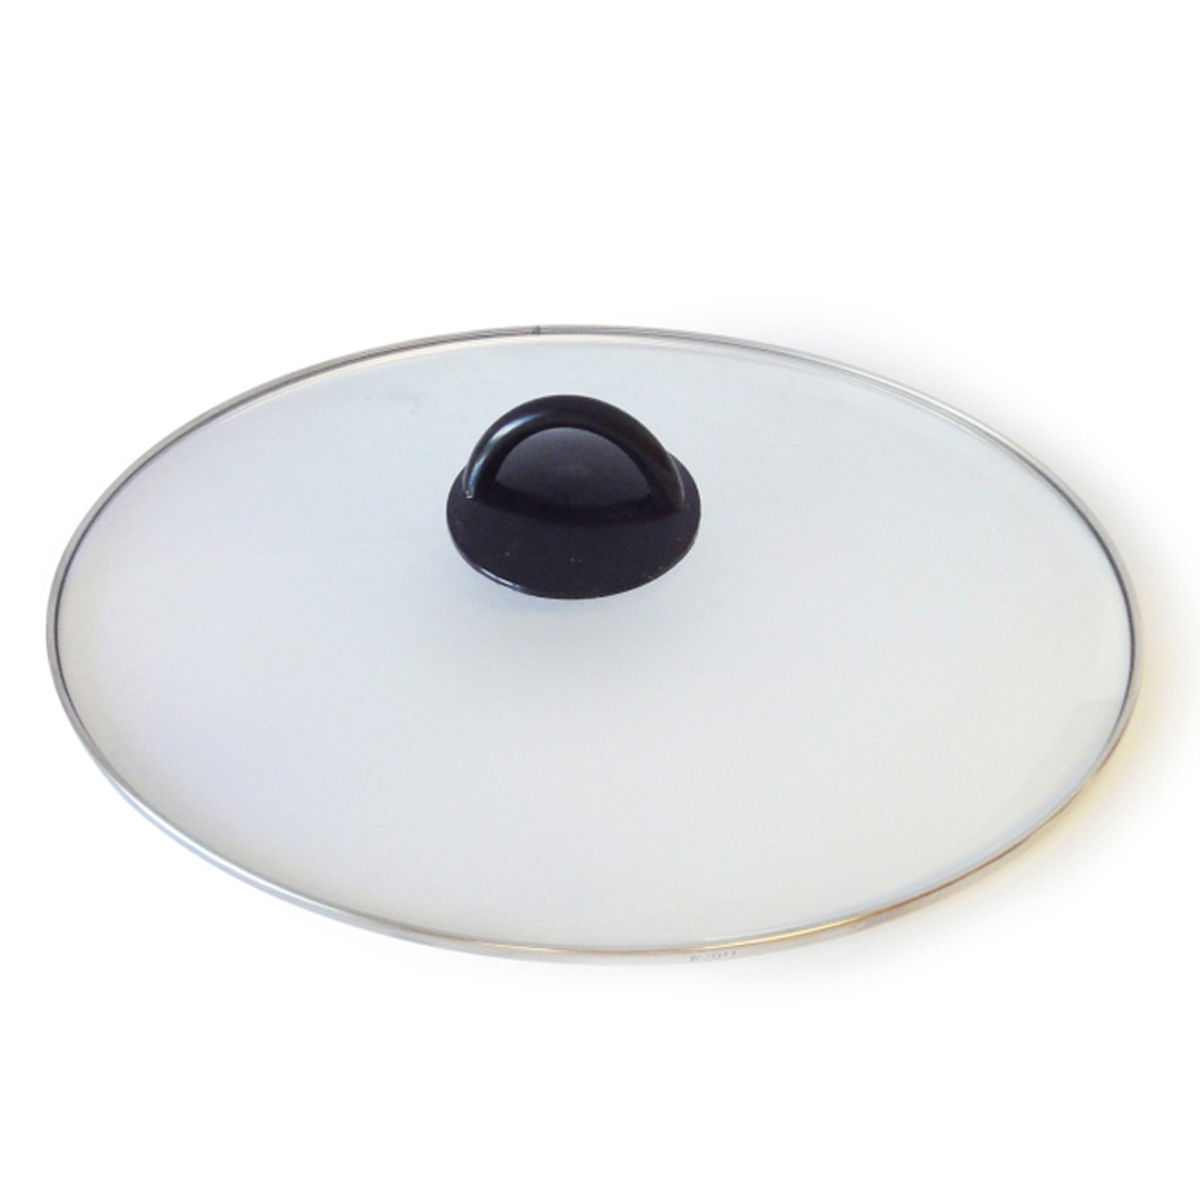 Crock-Pot® Slow Cooker Lid